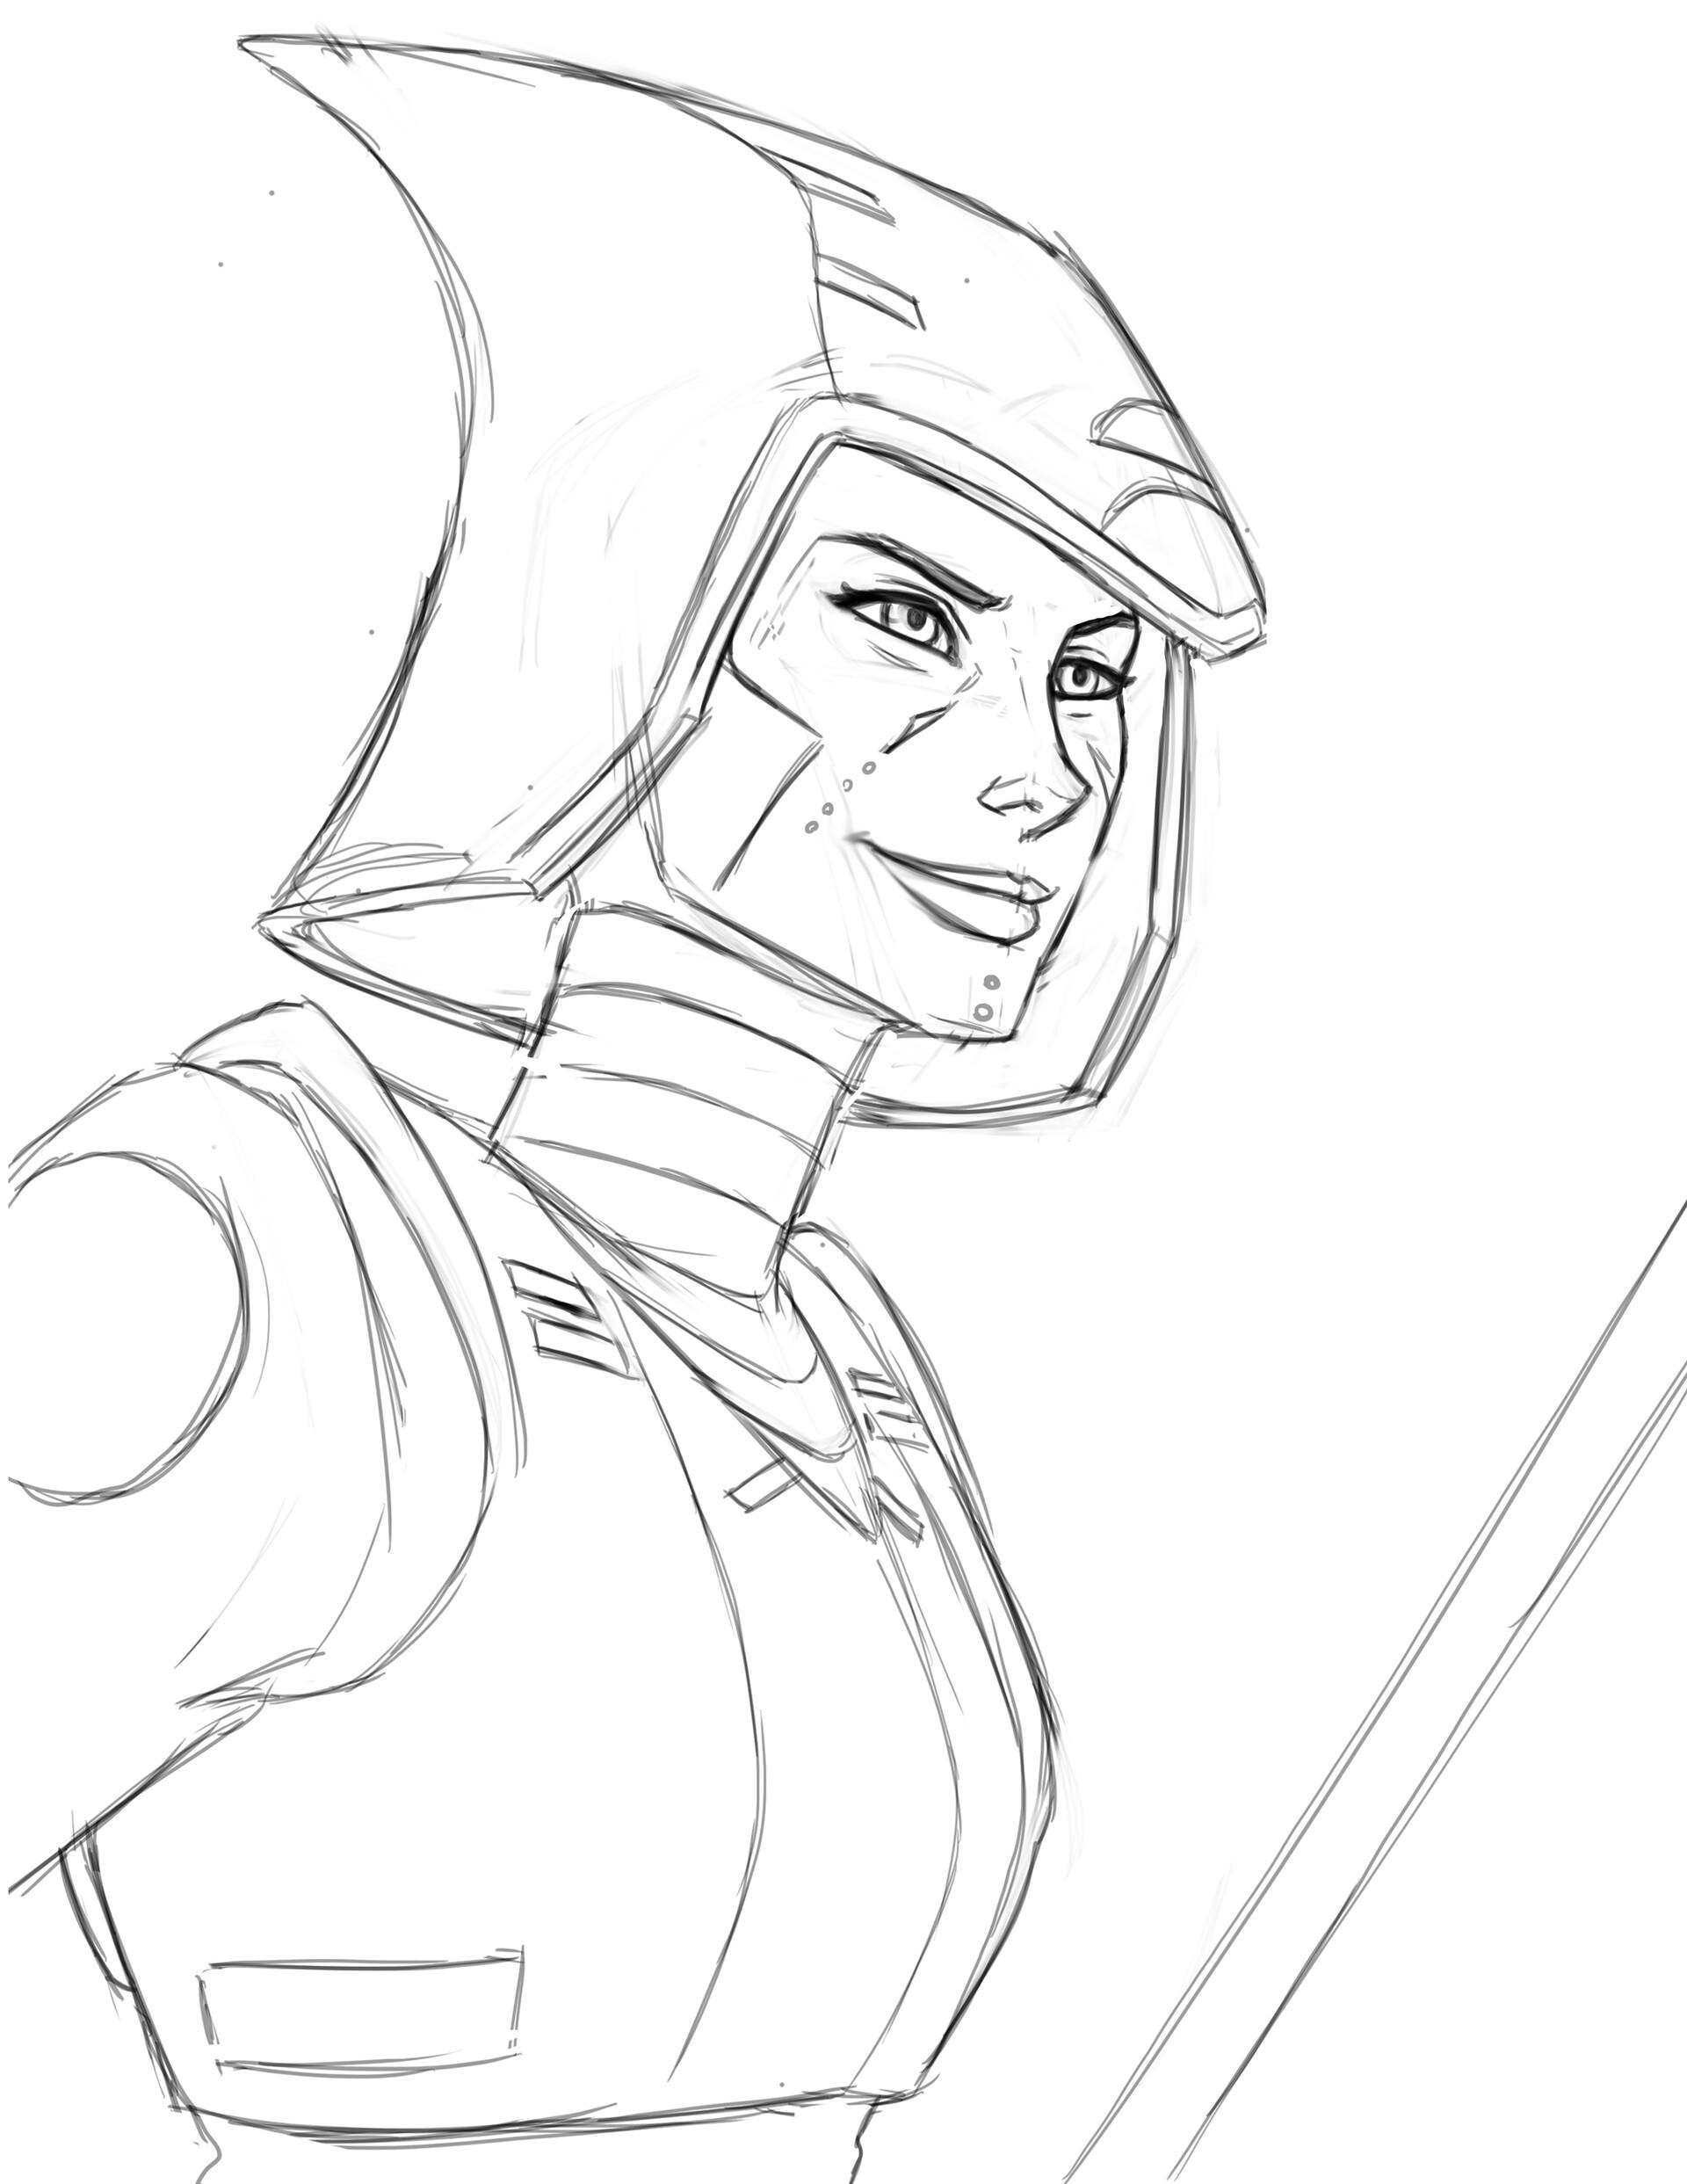 My initial Sketch